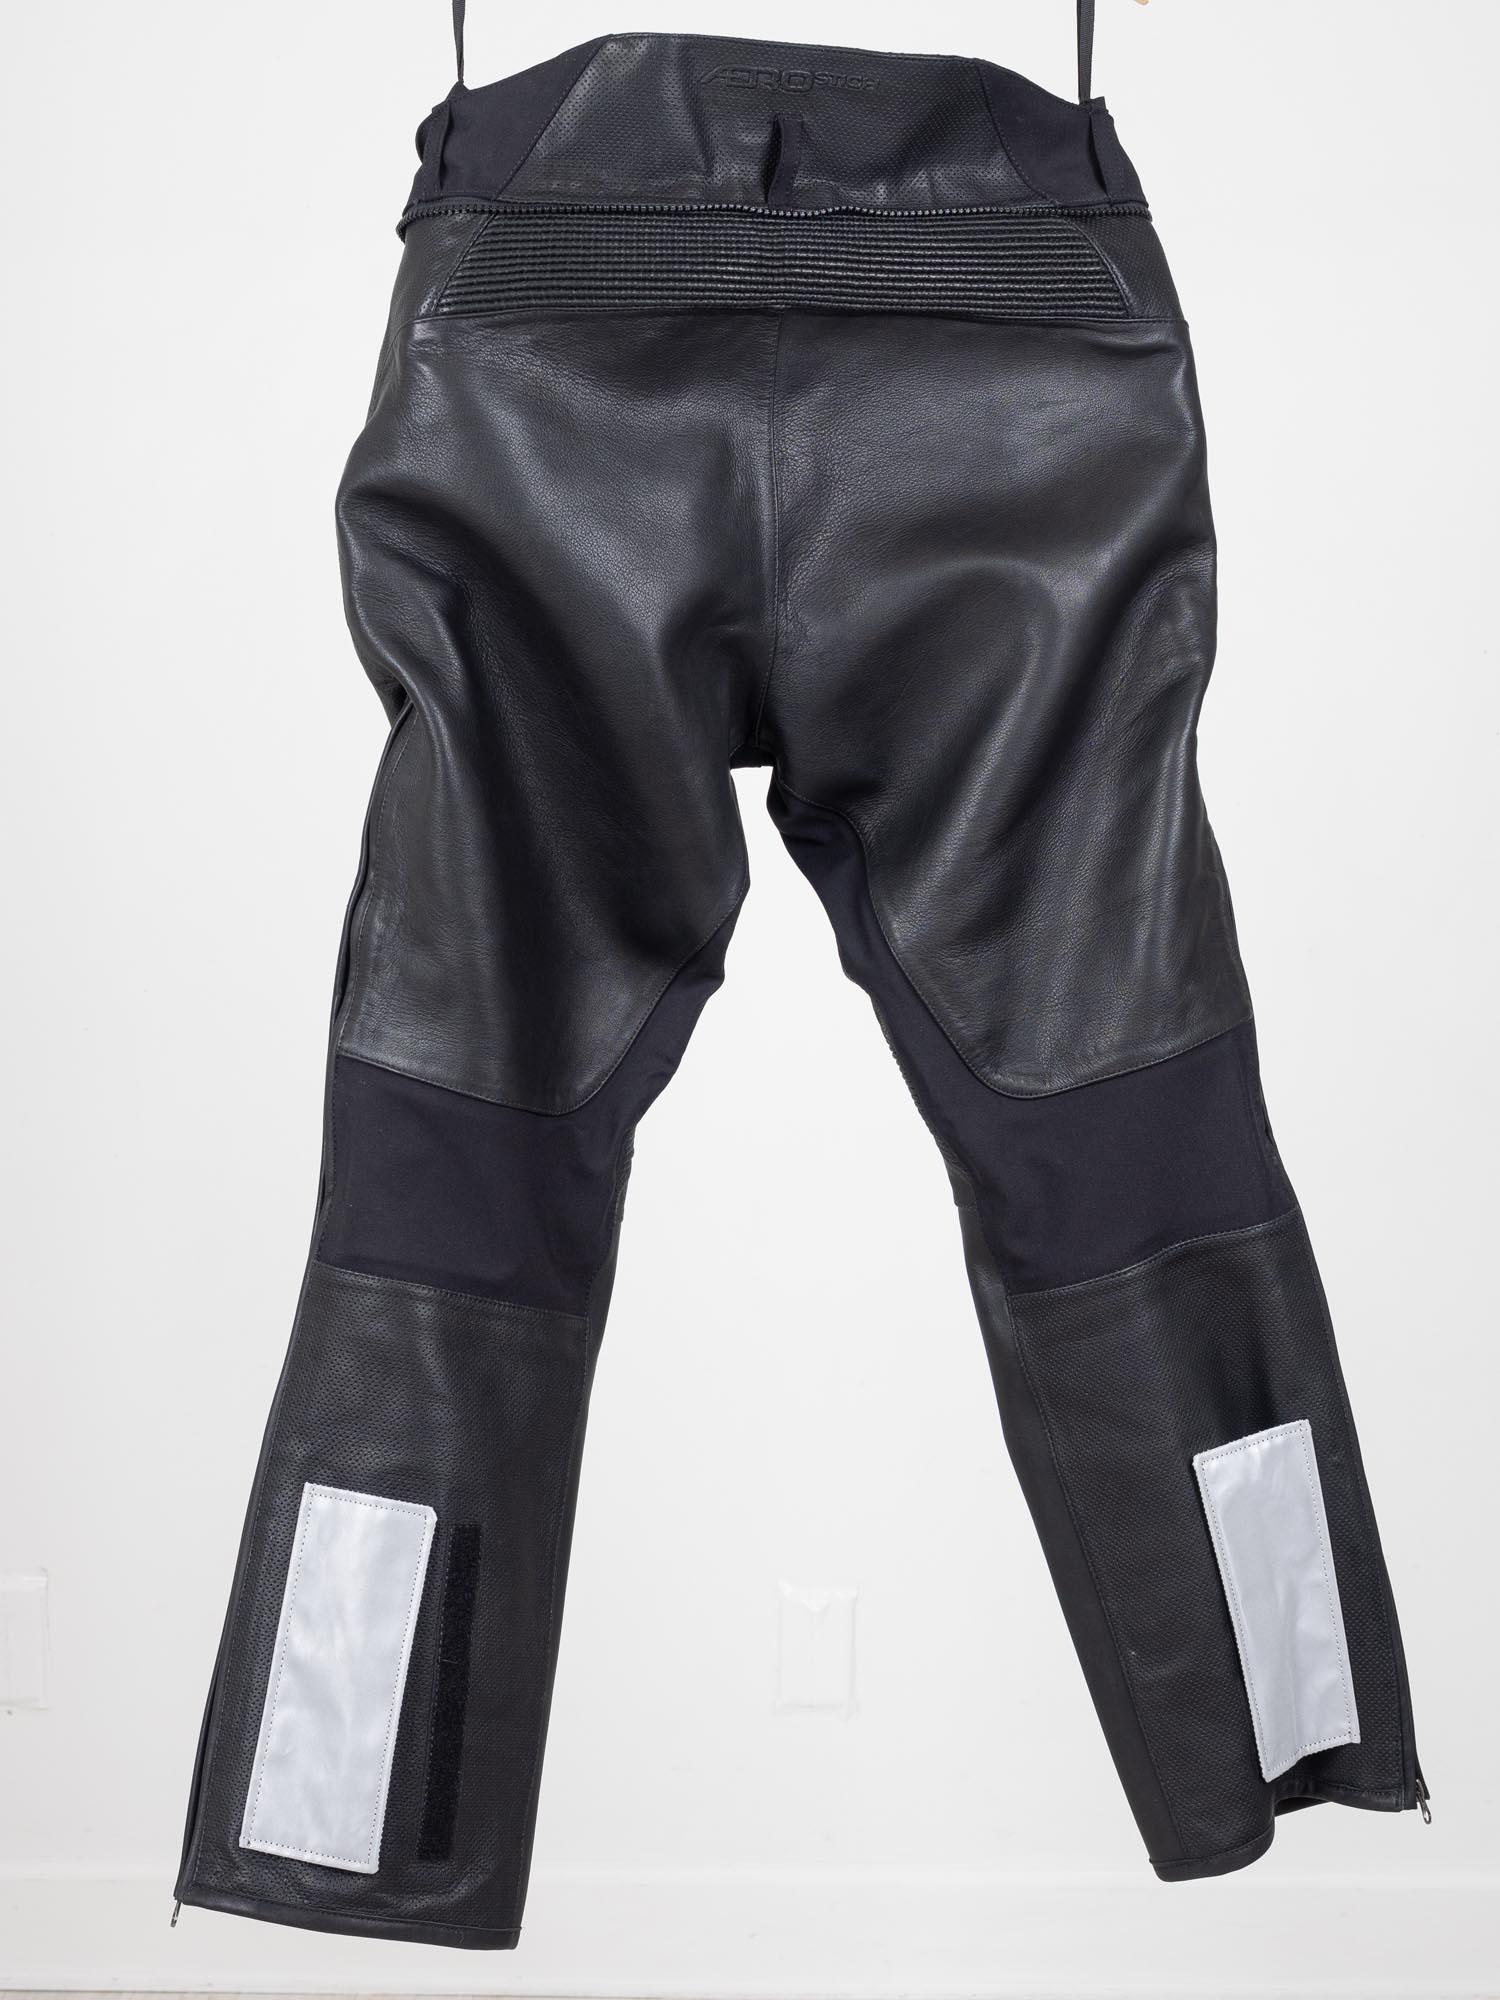 Aerostich Transit 3 Pants Reflectors